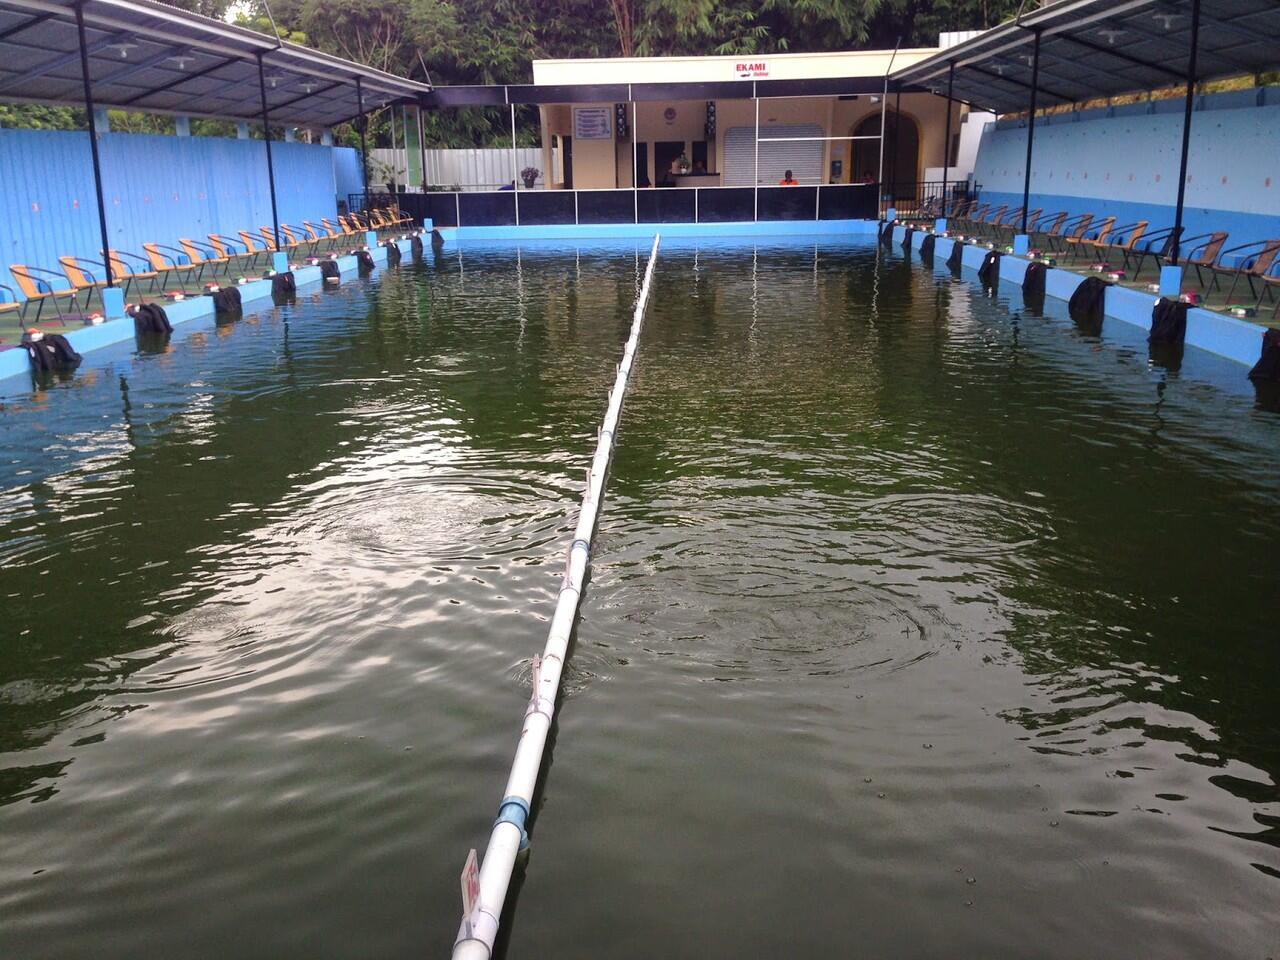 EKAMI FISHING Pemancingan Galatama LELE dengan konsep berdasarkan Pengalaman